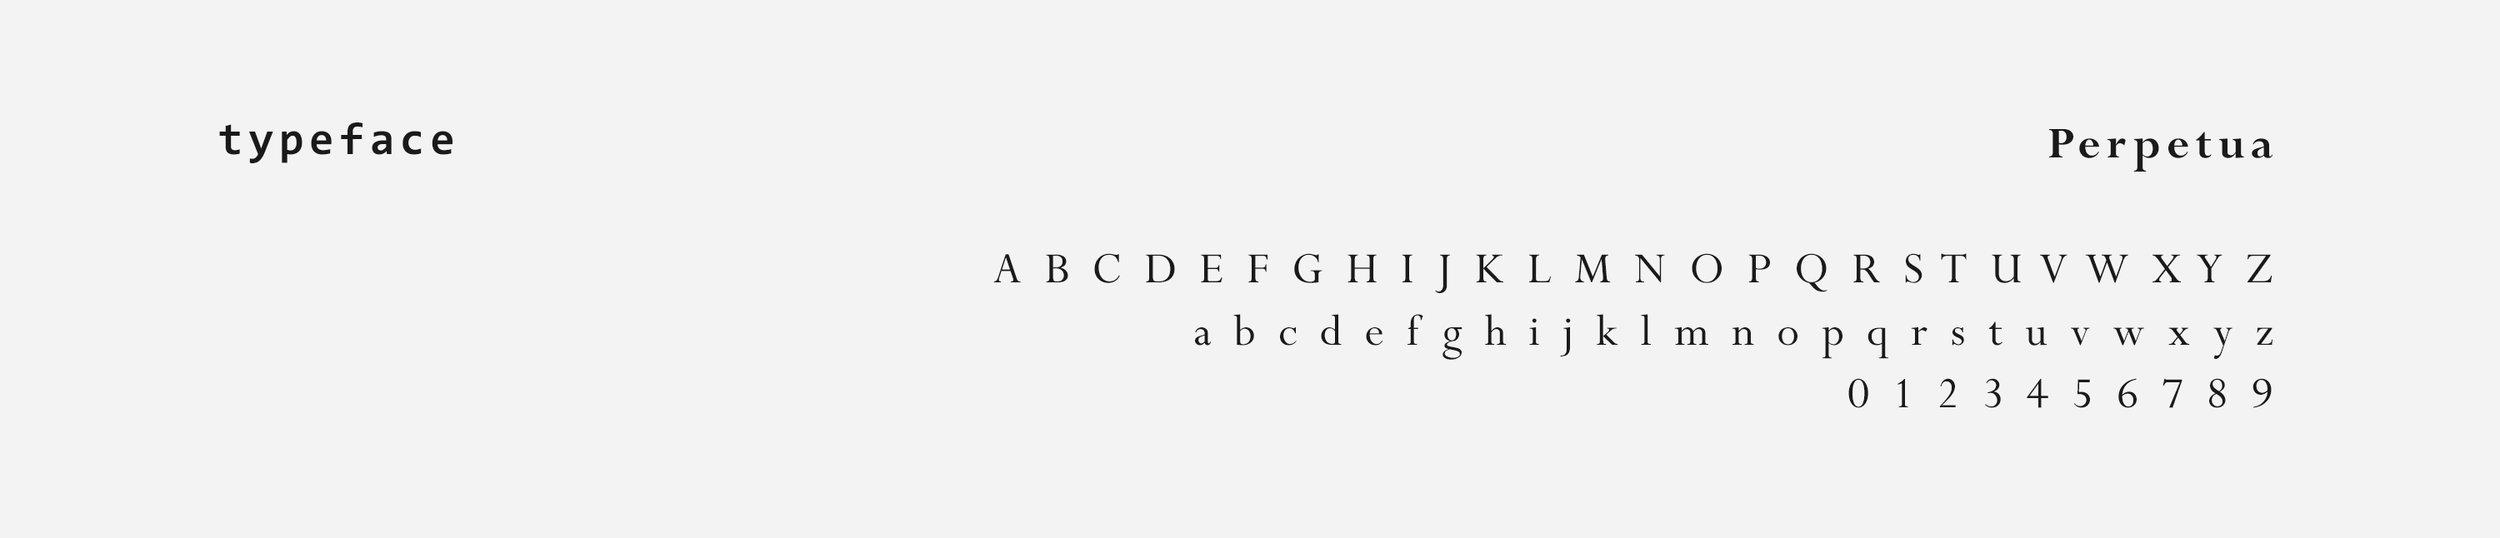 brand board typeface.jpg